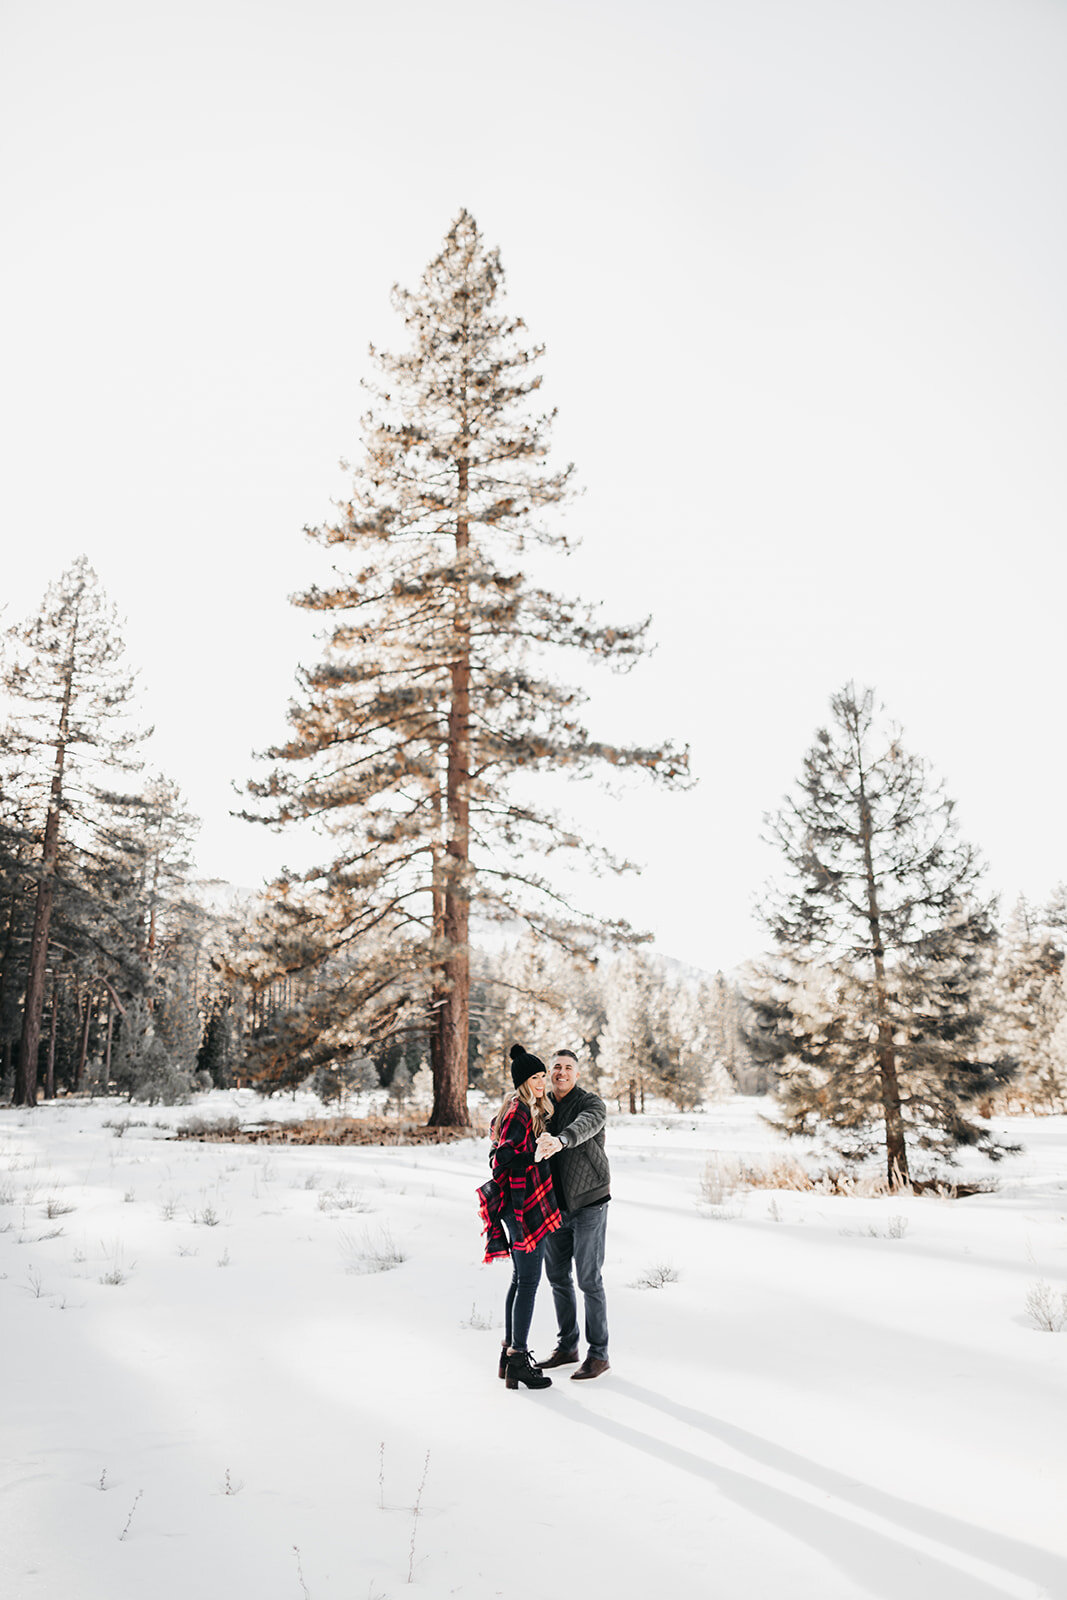 Tahoe winter photo session